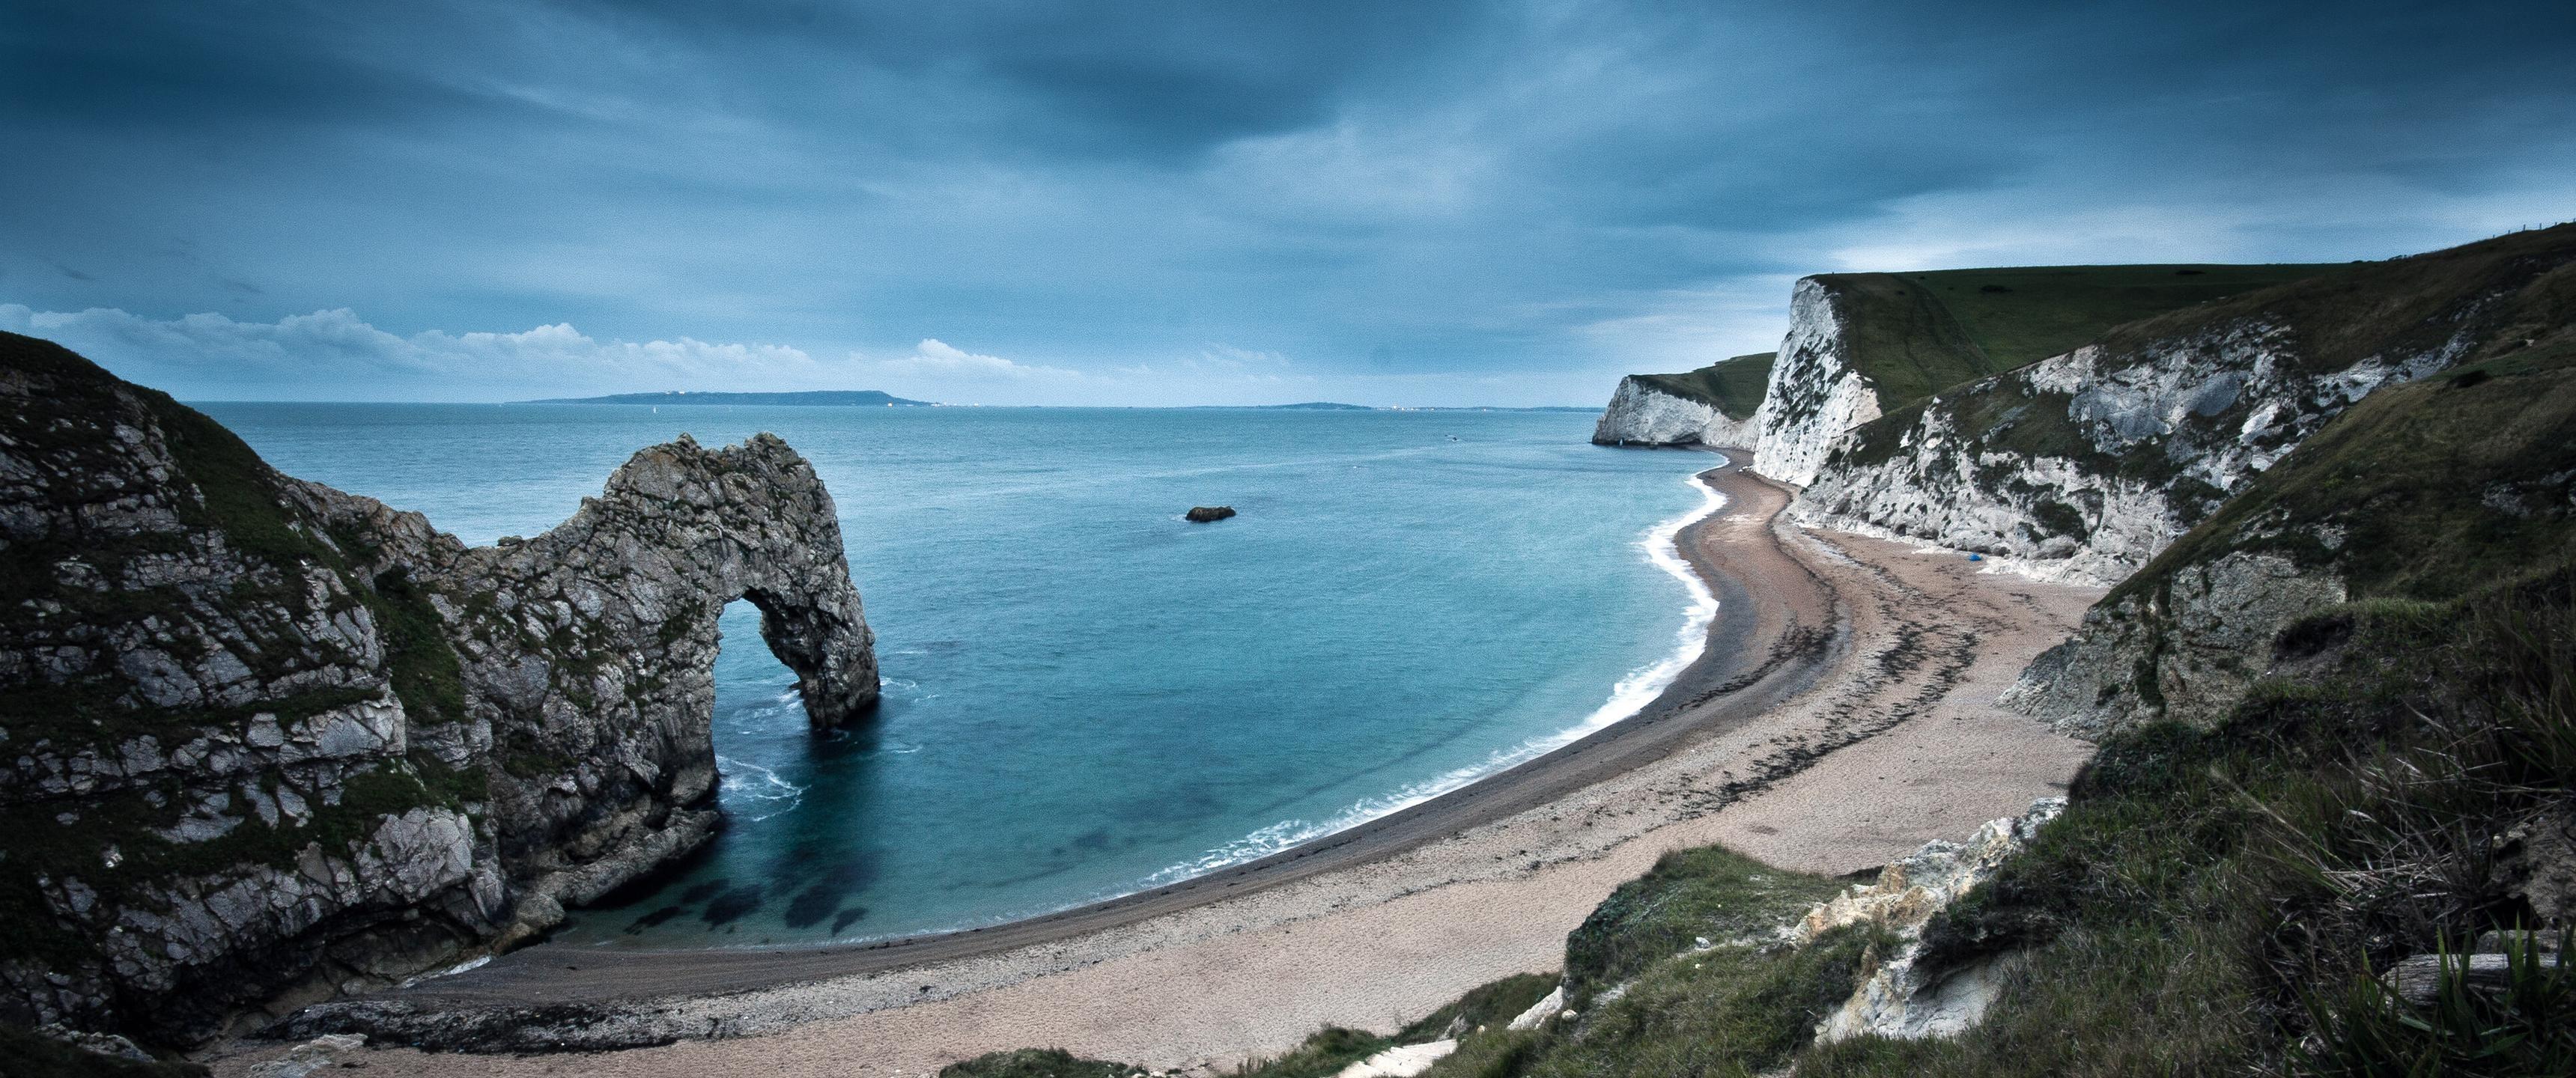 General 3440x1440 nature wide angle coast cliff sea Durdle Door England jurassic coast (england)